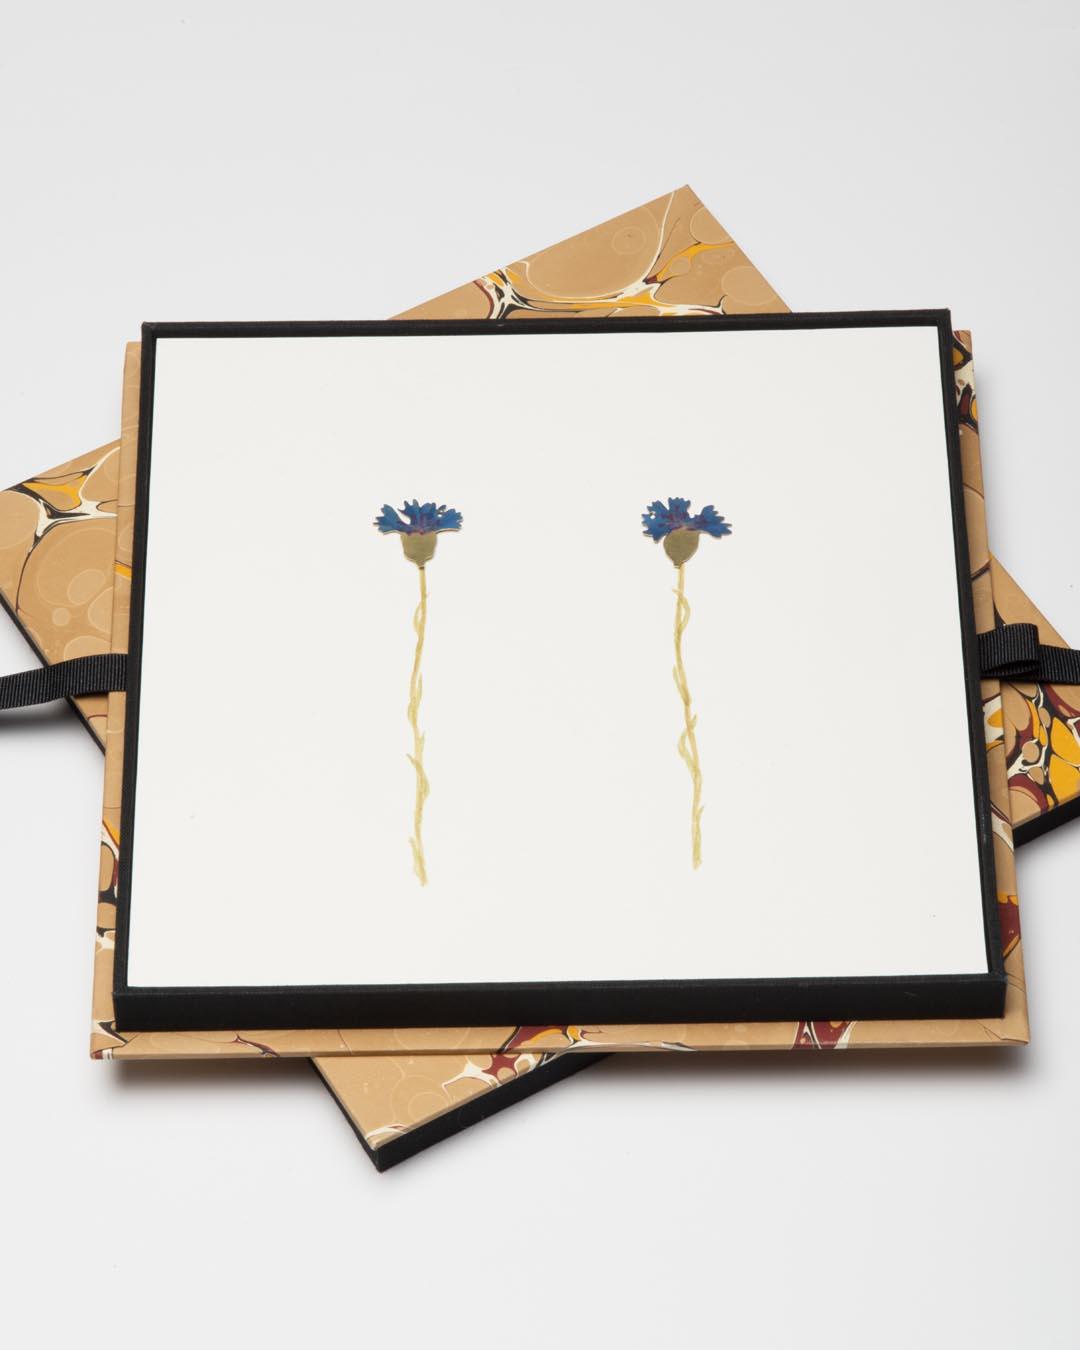 Christopher Thompson Royds, Natura Morta: cornflowers, 2019, stud earrings; 18ct gold, hand-painted, diamonds, 20 x 20 mm, €1150 (image 1/2)